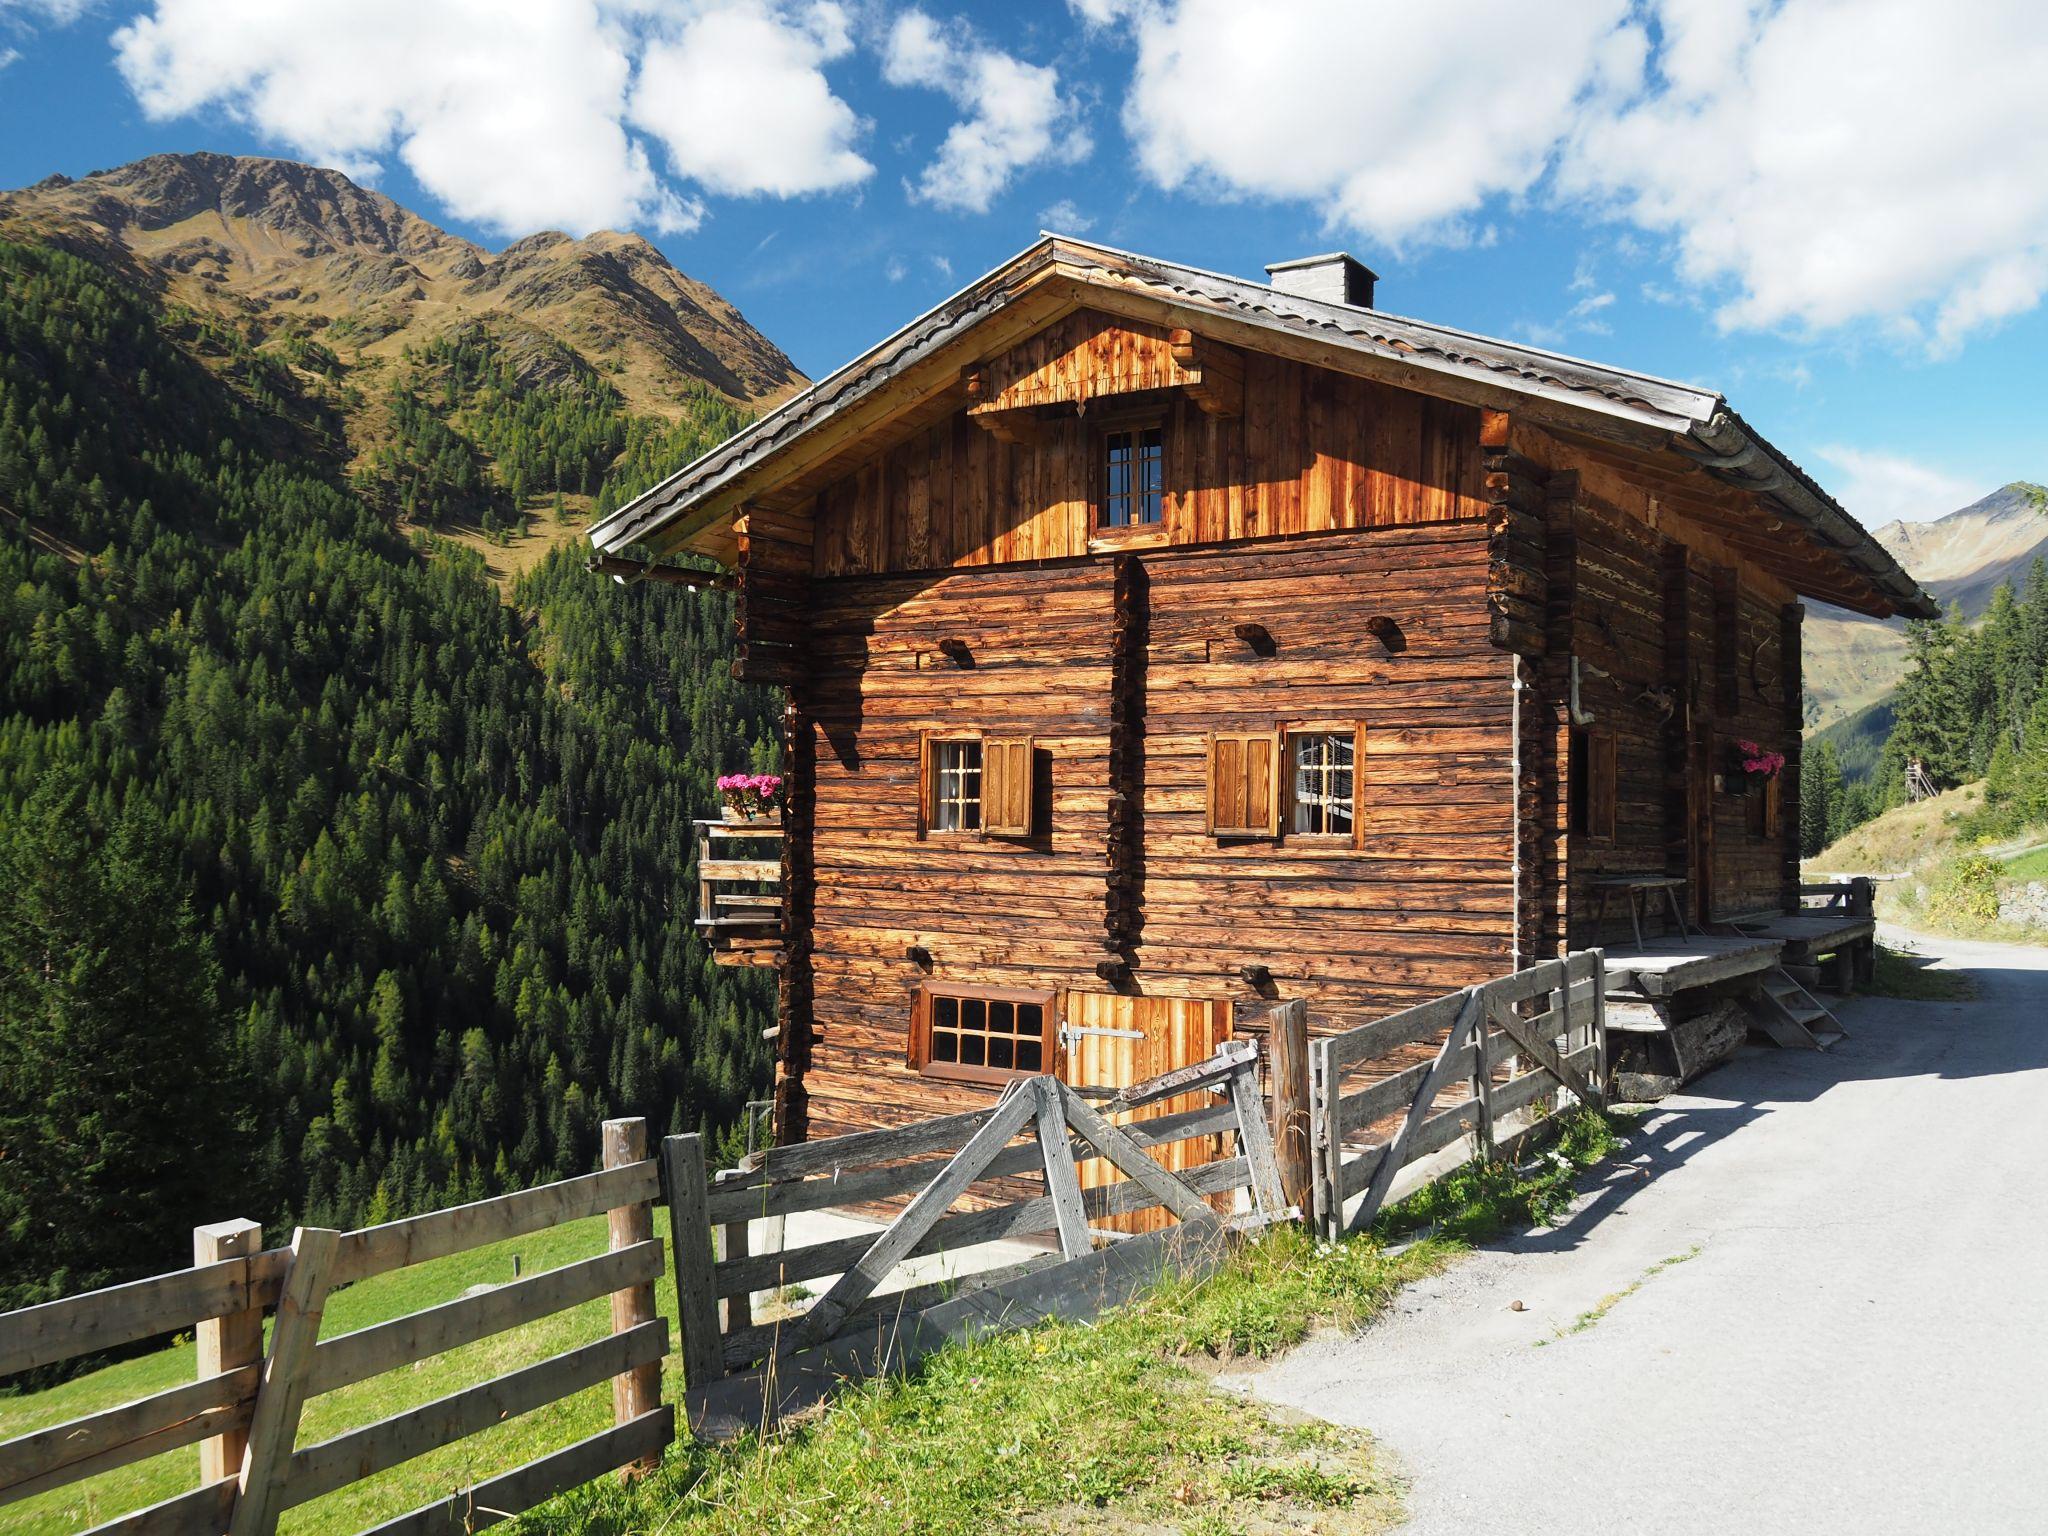 Osttiroler farm house, Austria